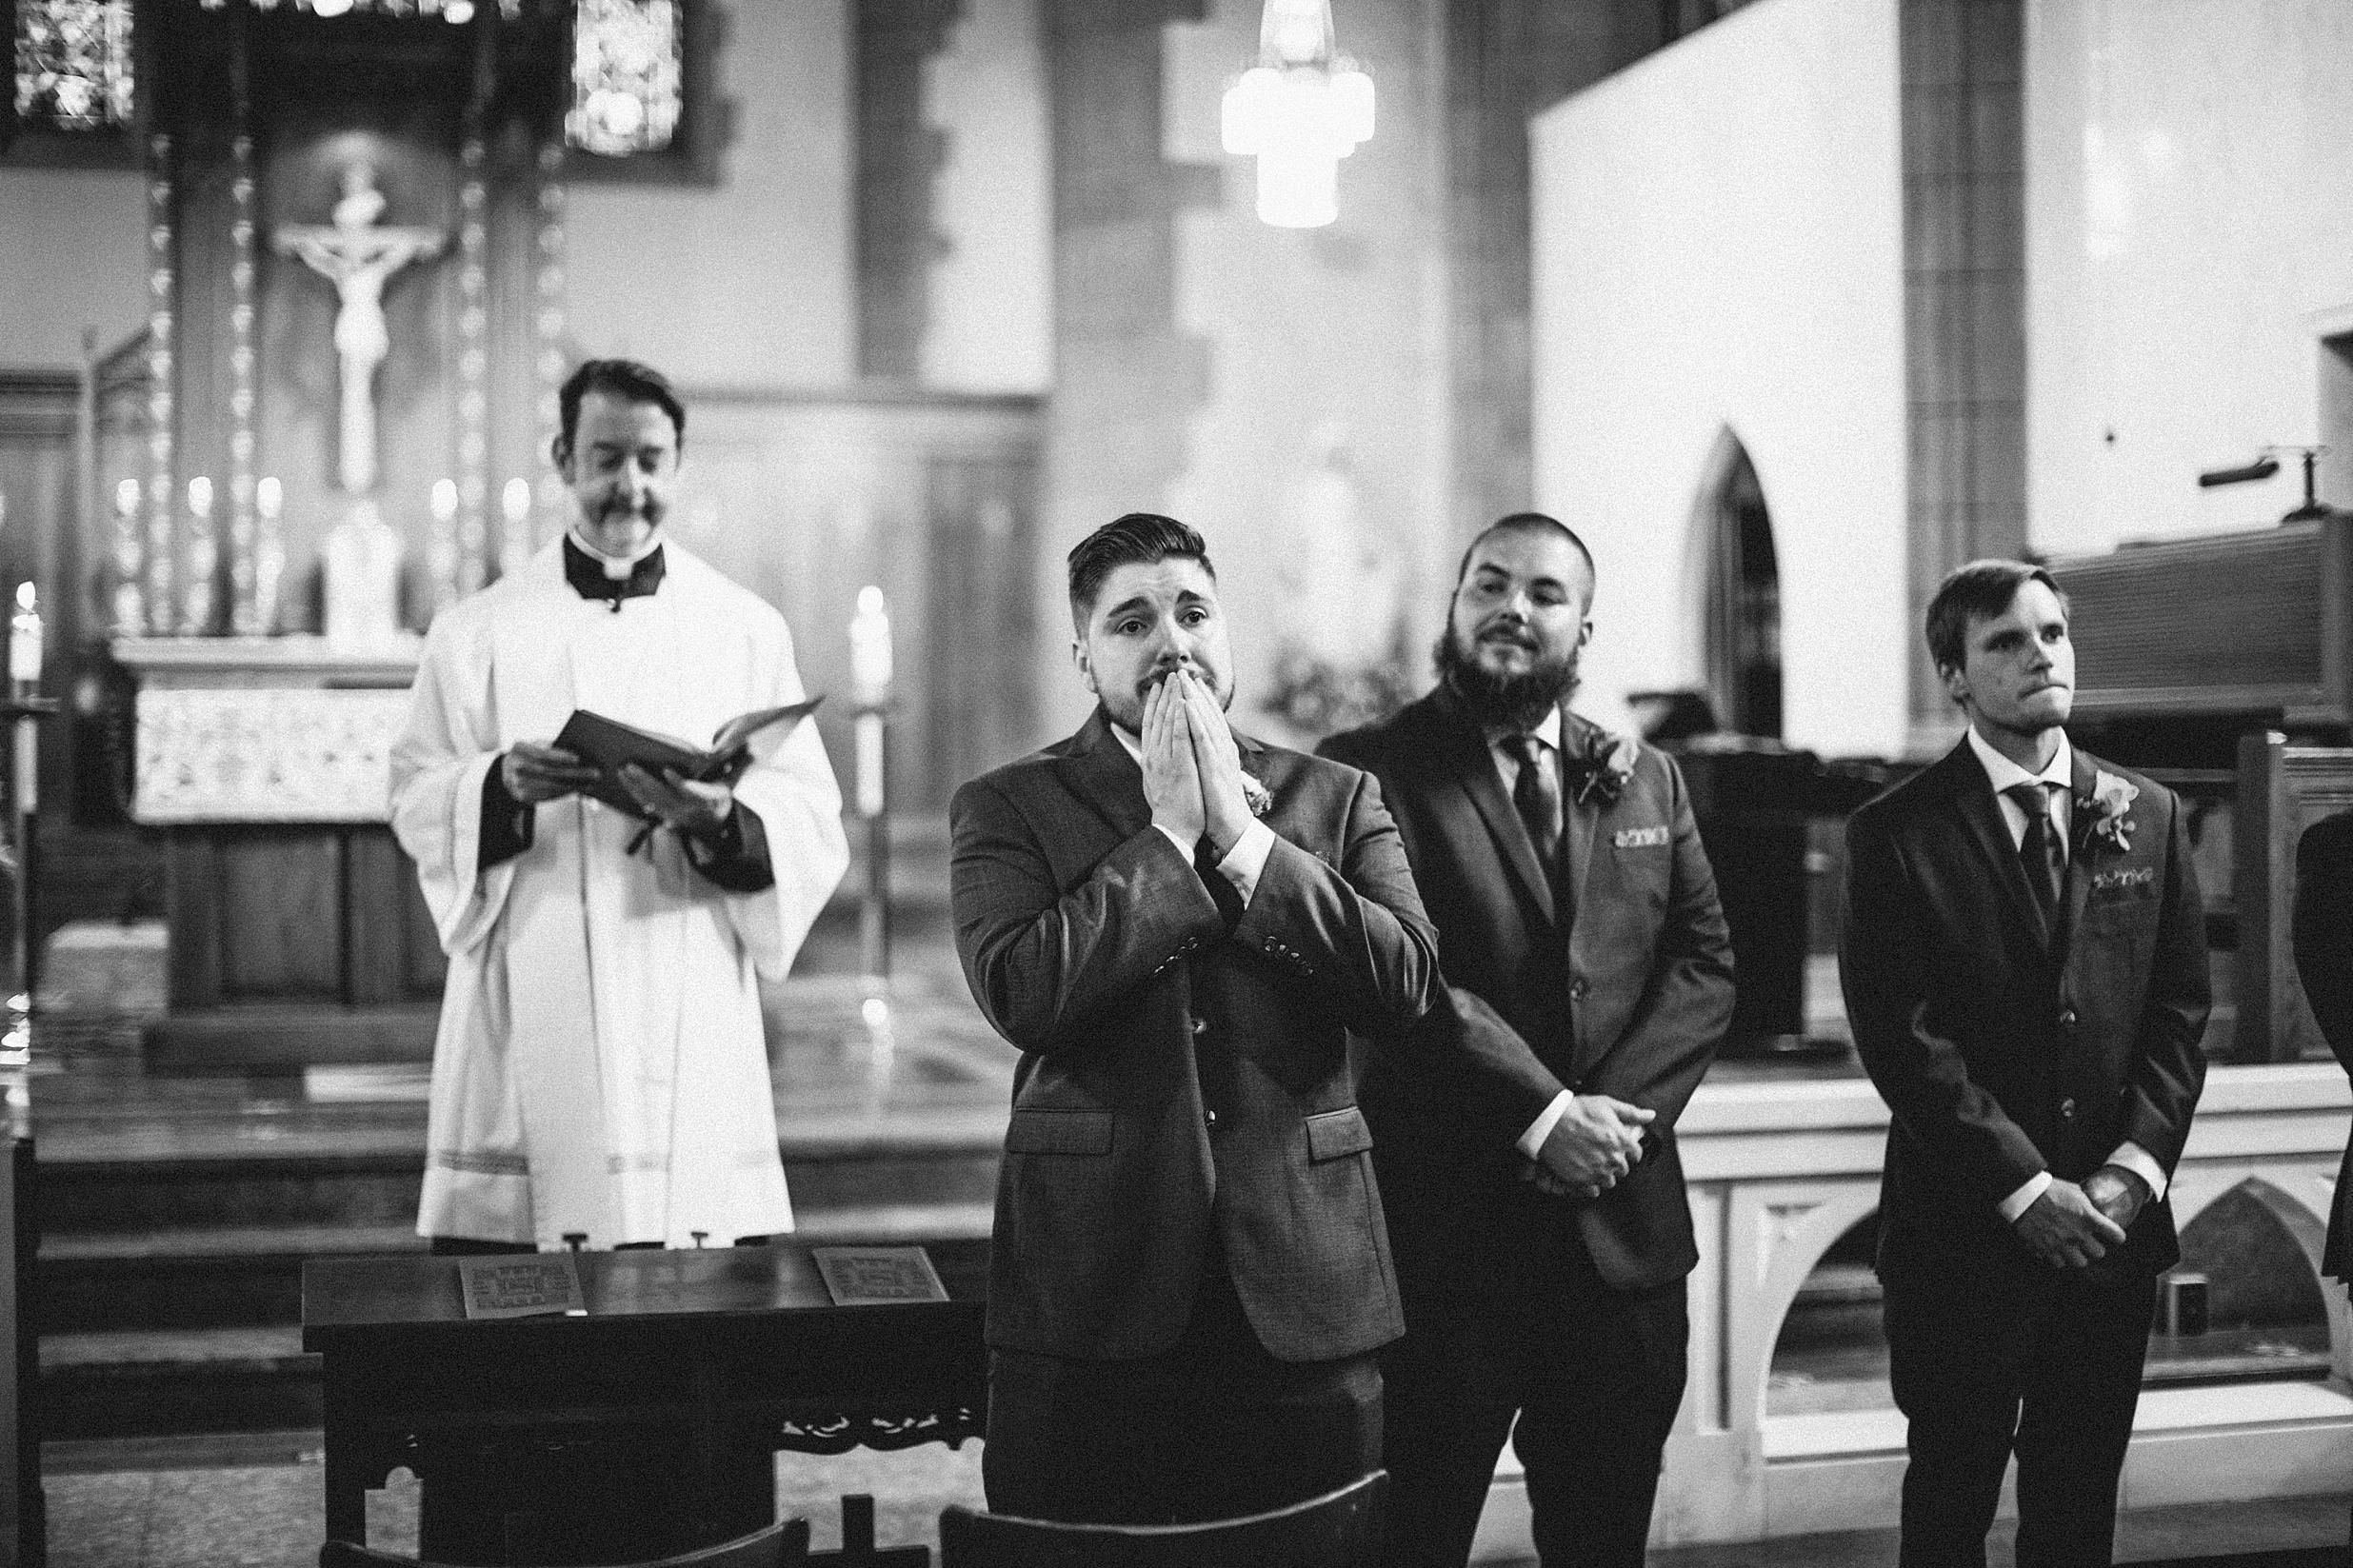 historic-upstate-ny-wedding-church-backyard-photographer_0015.jpg